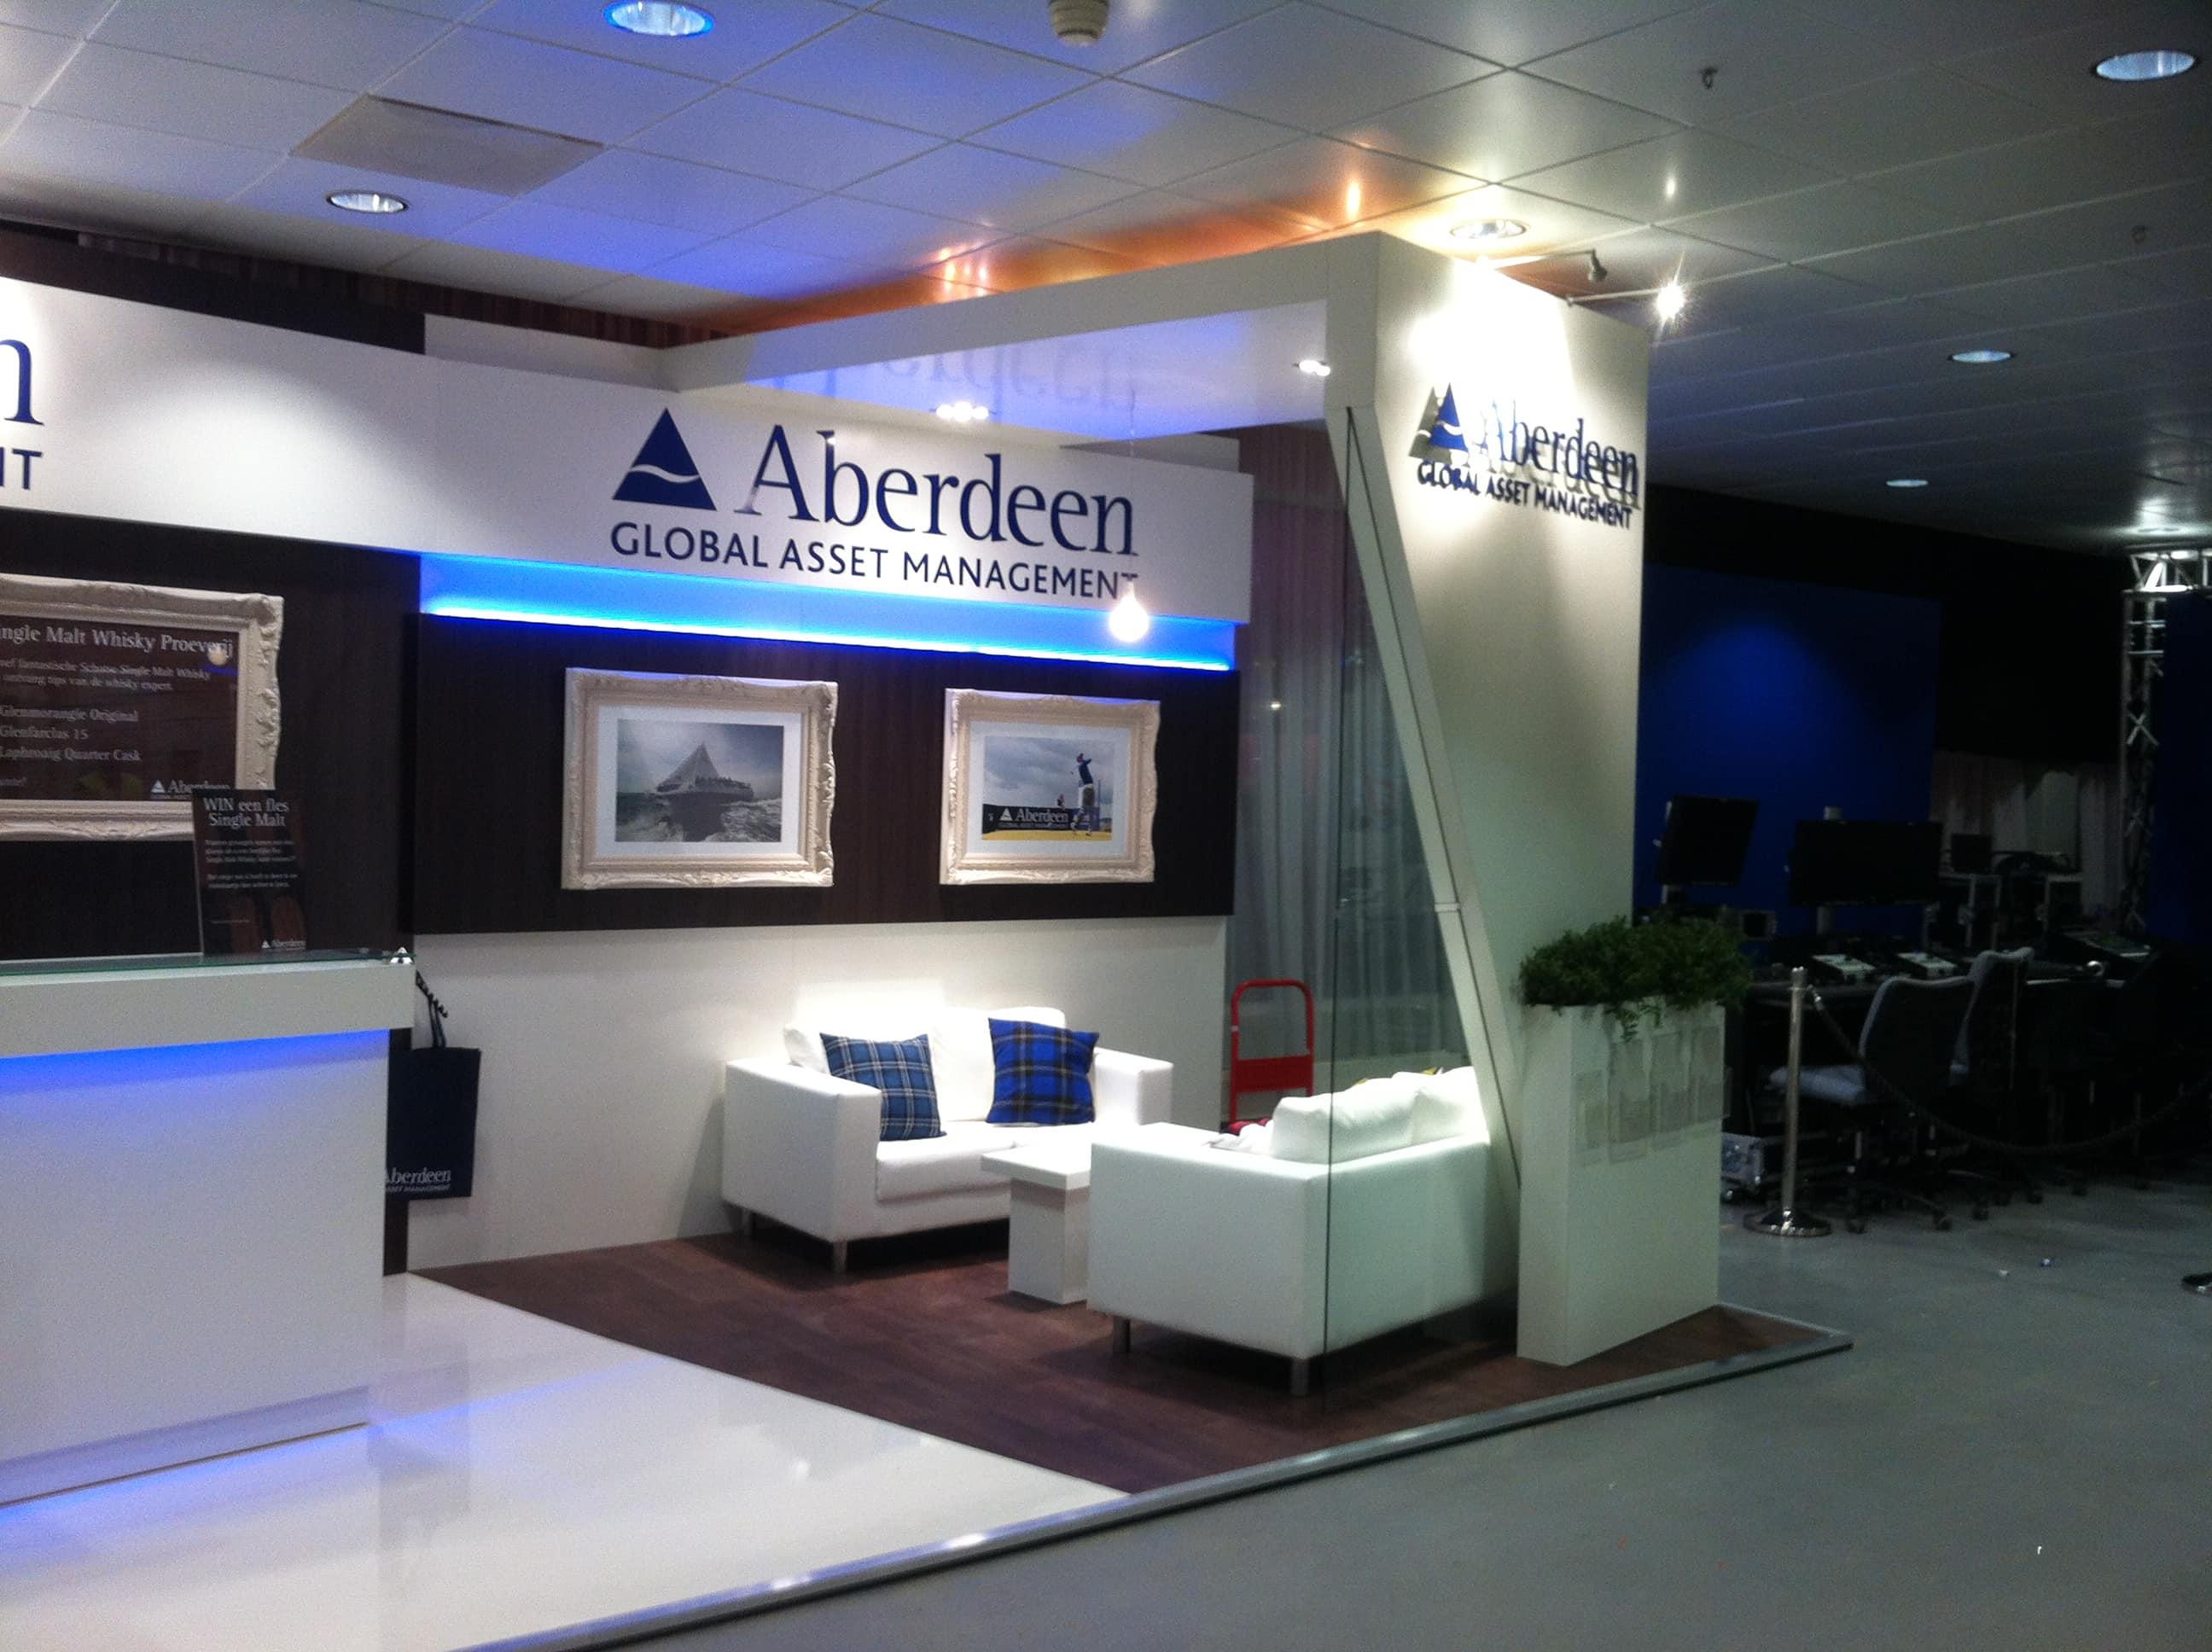 Exhibition Stand Builders Aberdeen : Aberdeen global asset management amsterdam display stand